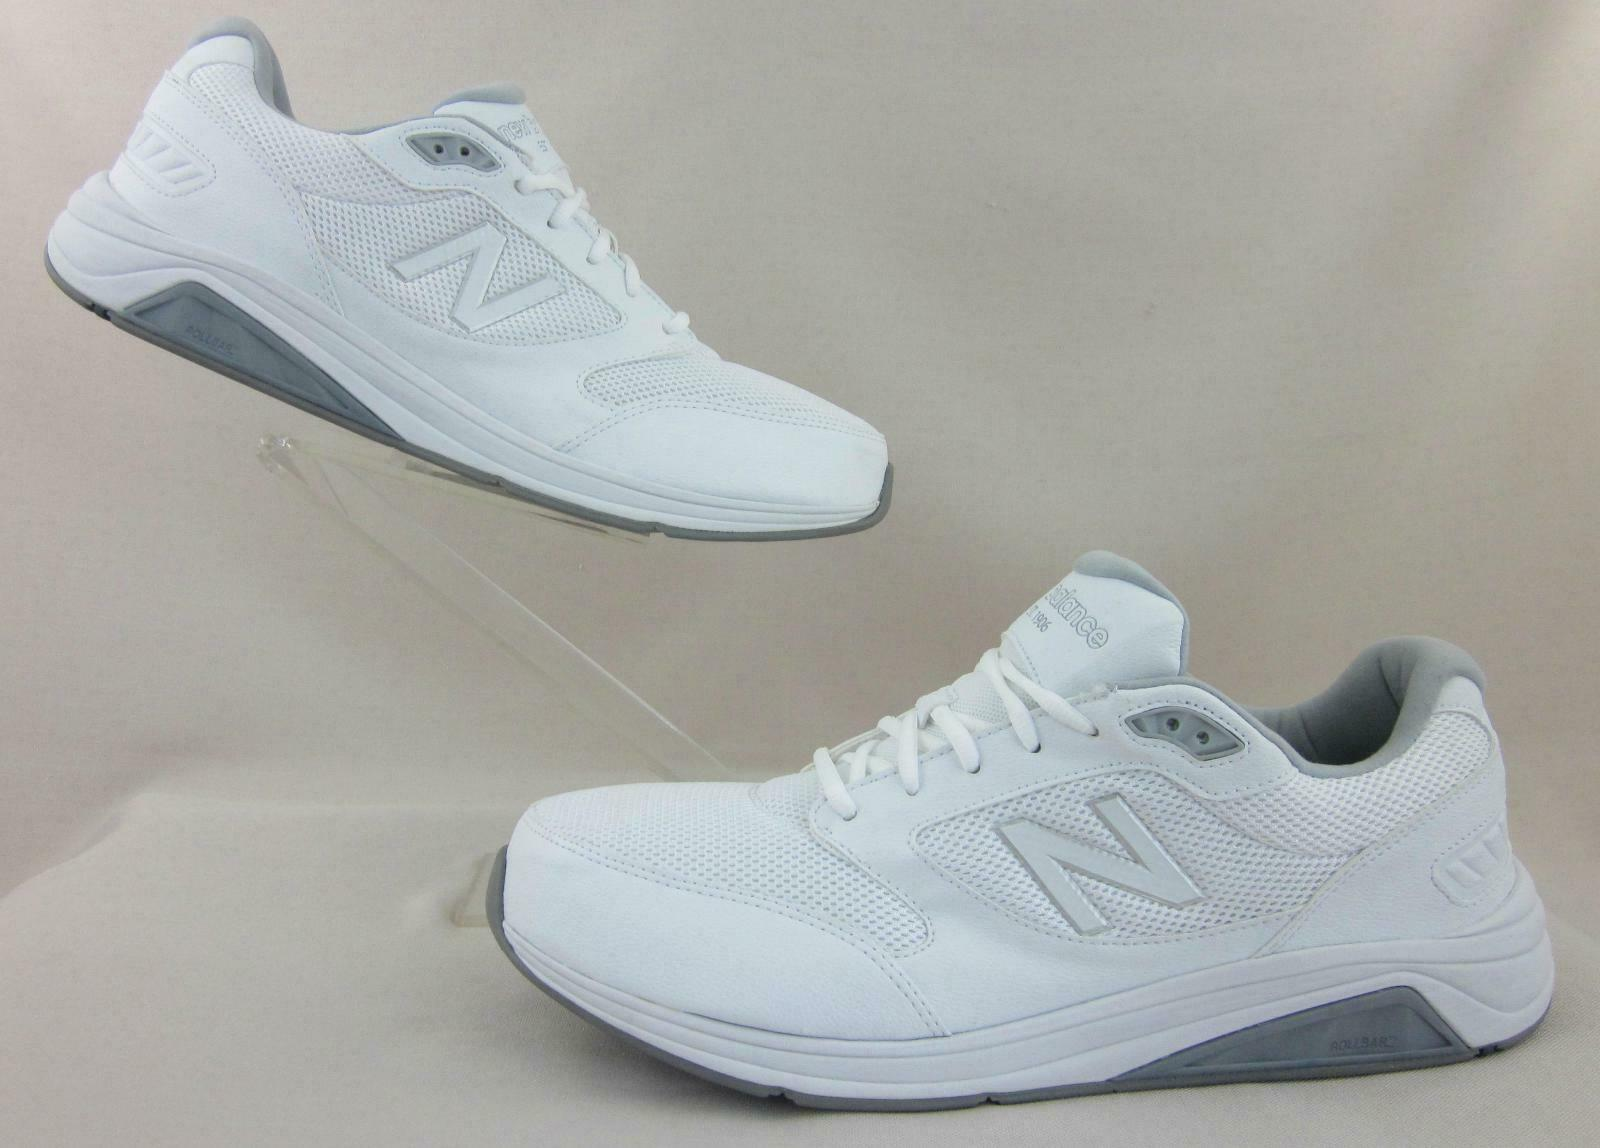 NEW  New Balance 928v2 Walking shoes White US 14 2E WIDE MW928WM2